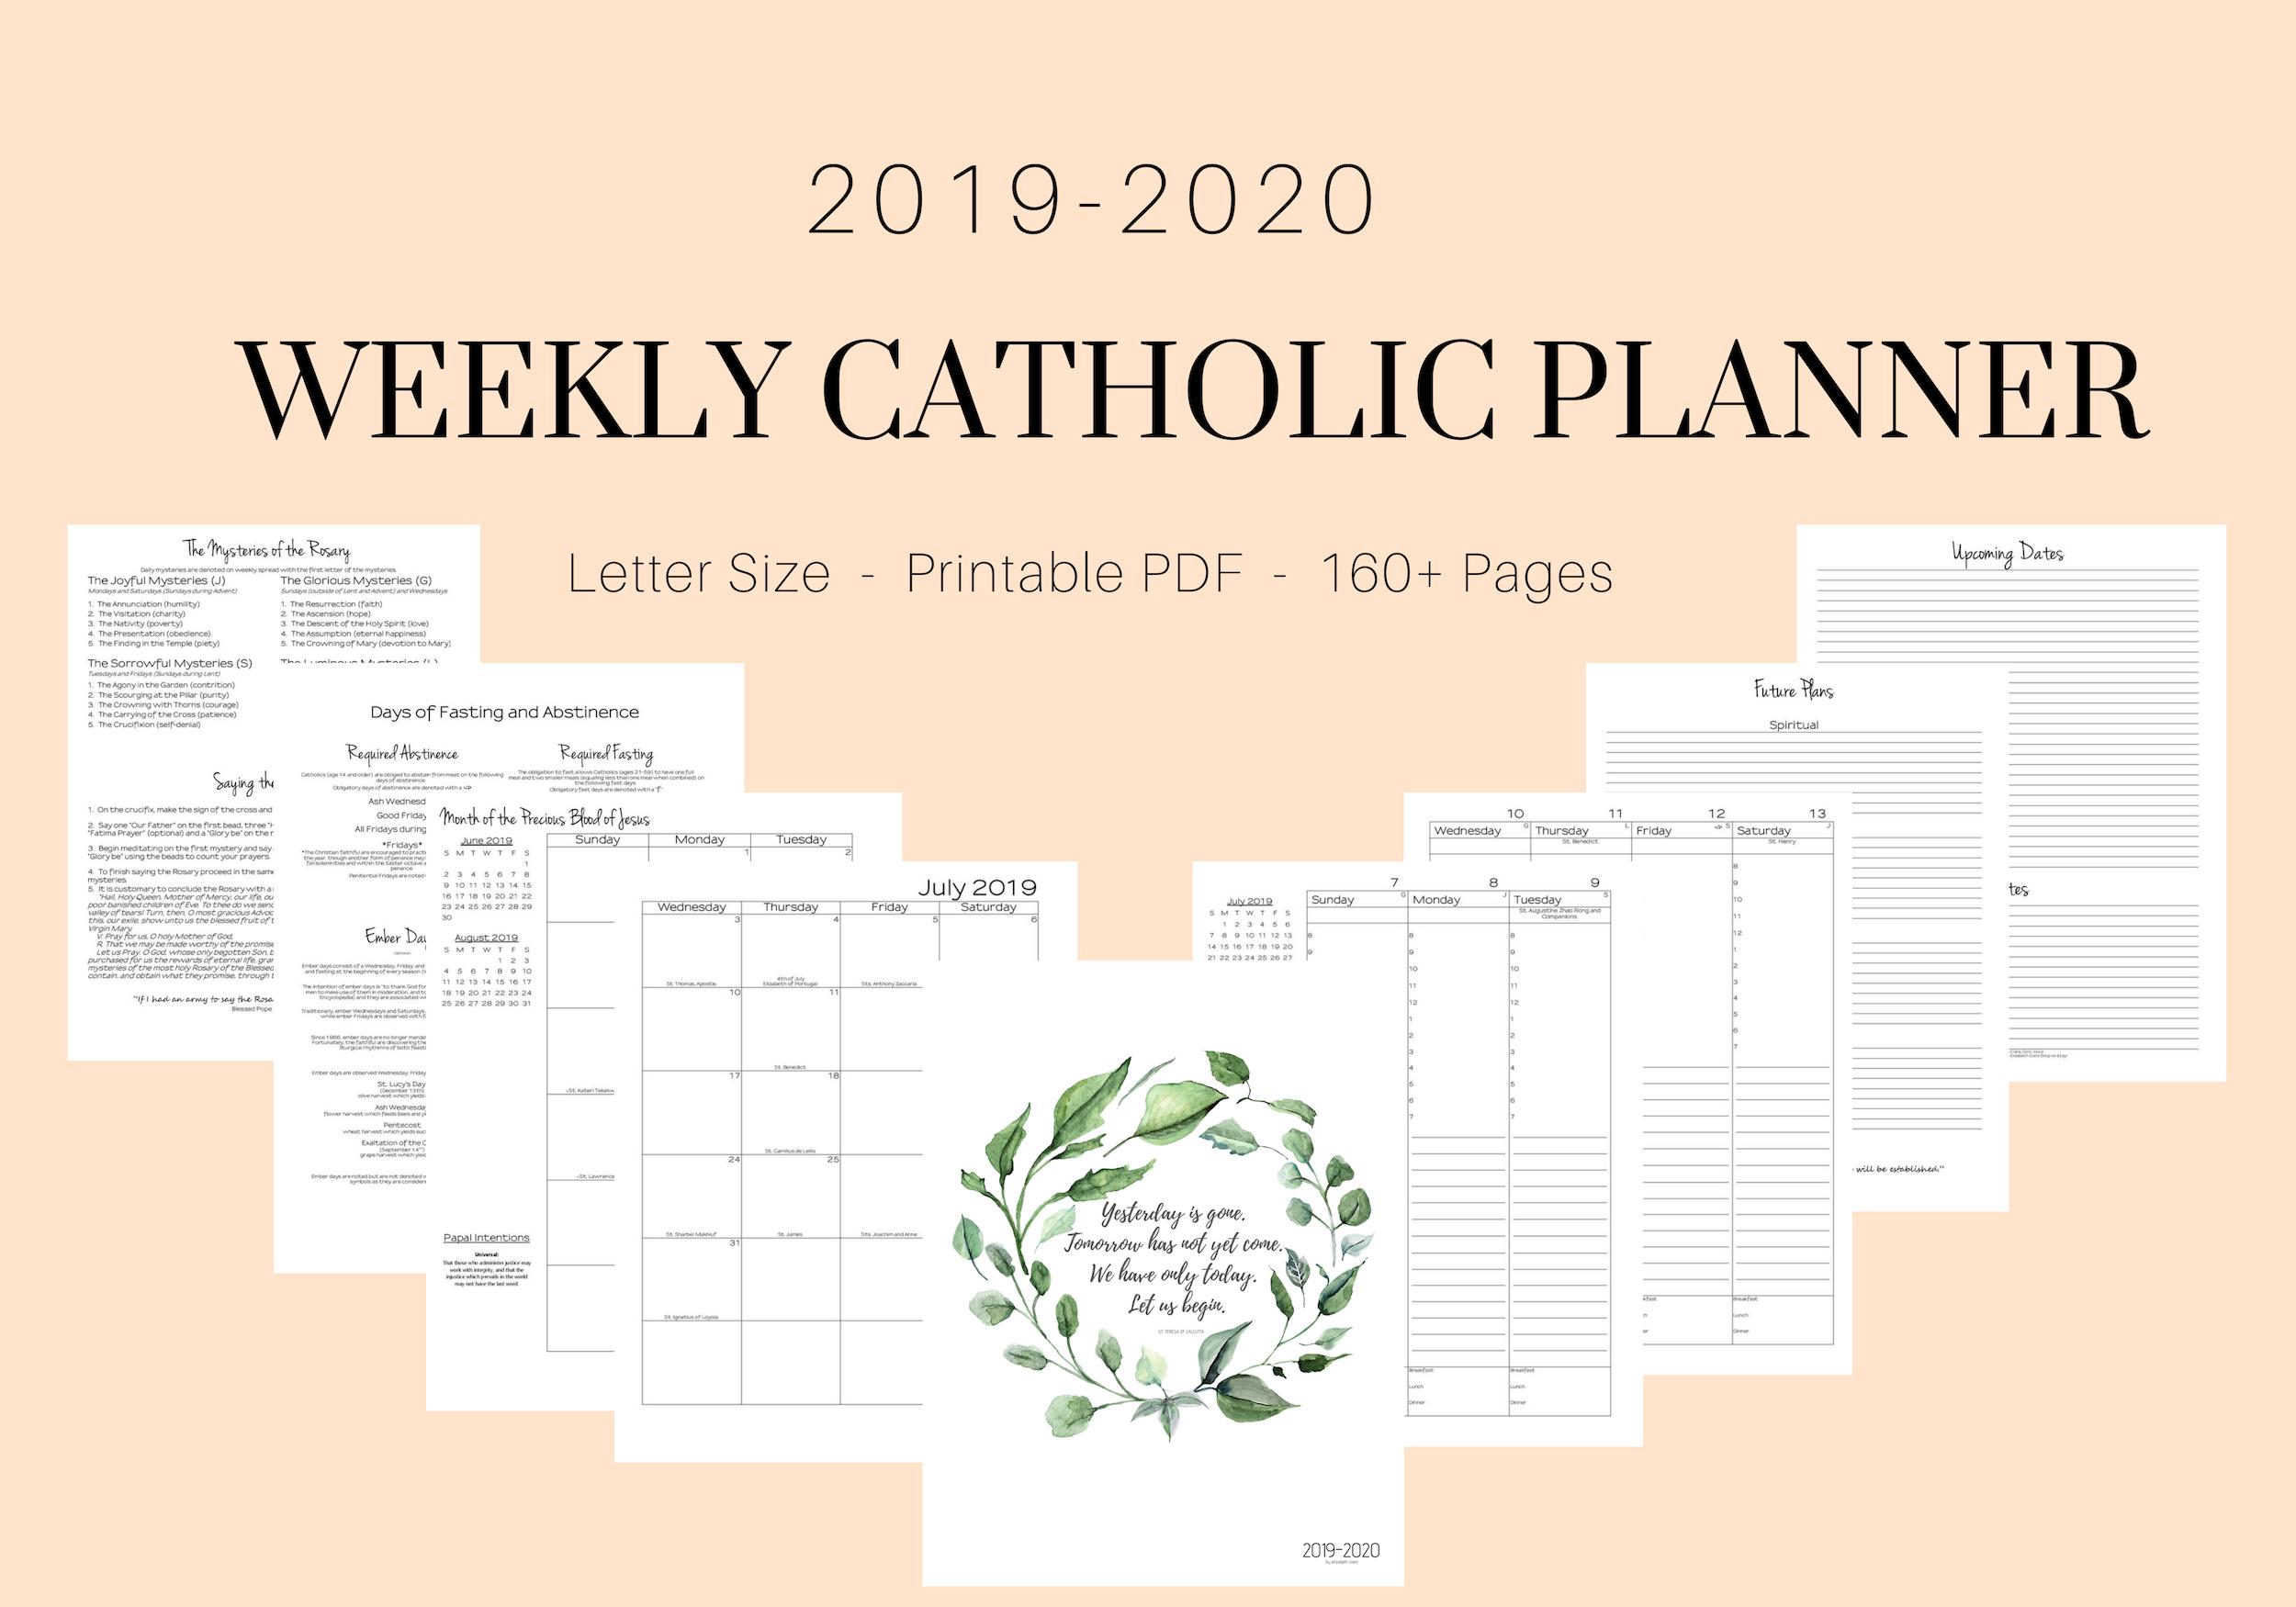 2019-2020 Catholic Weekly Planner